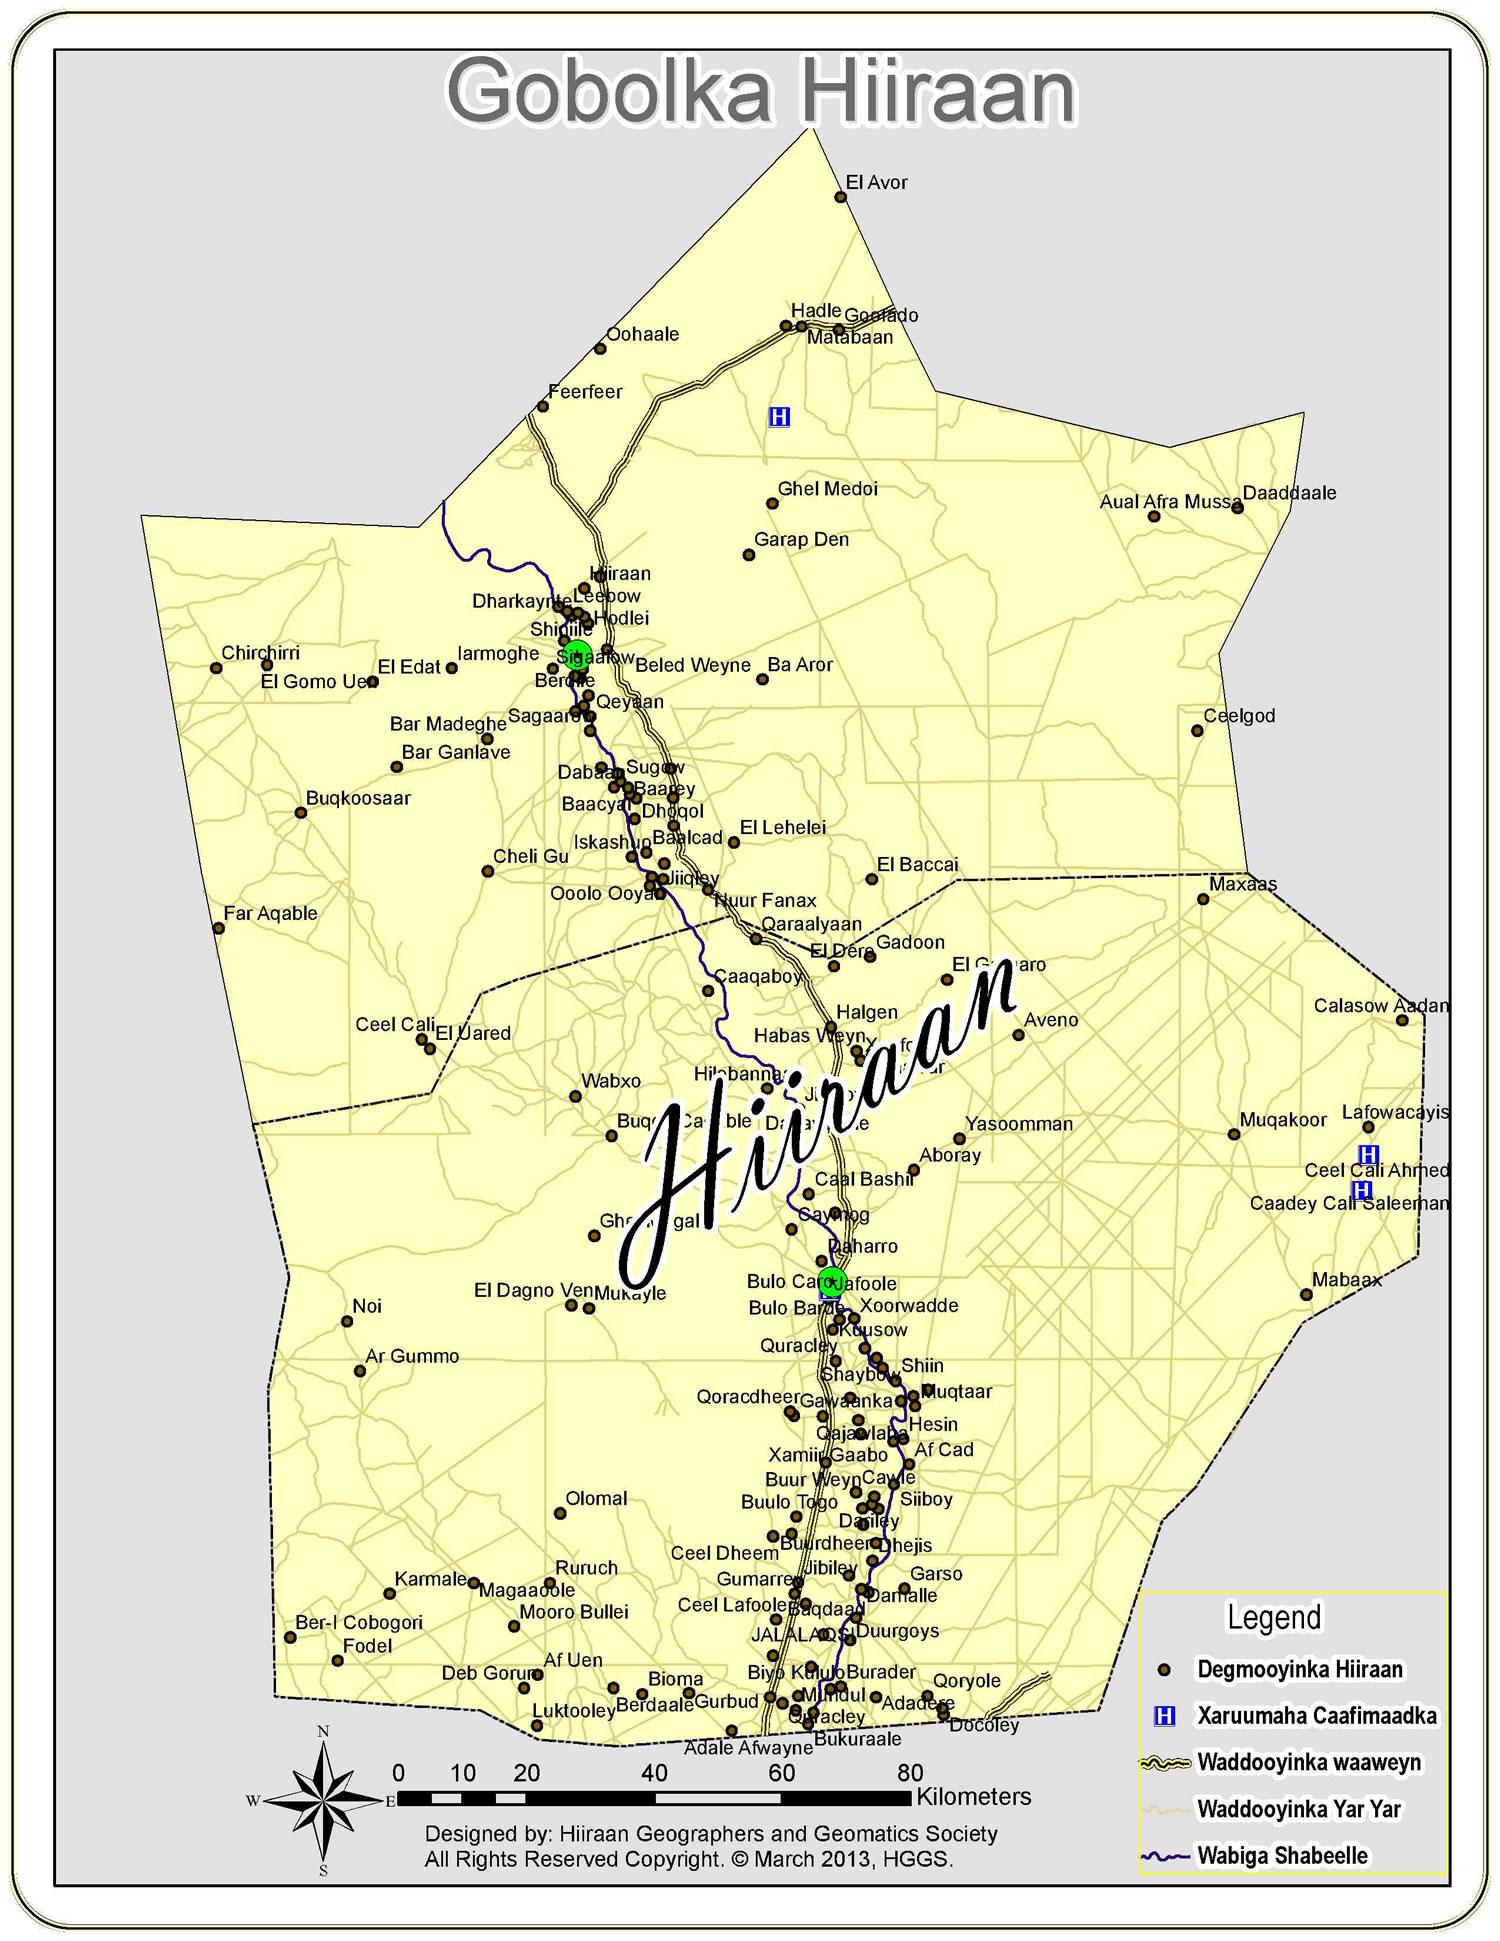 http://www.hiiraan.org/images/2013/Mar/Hiiraan_Map.jpg